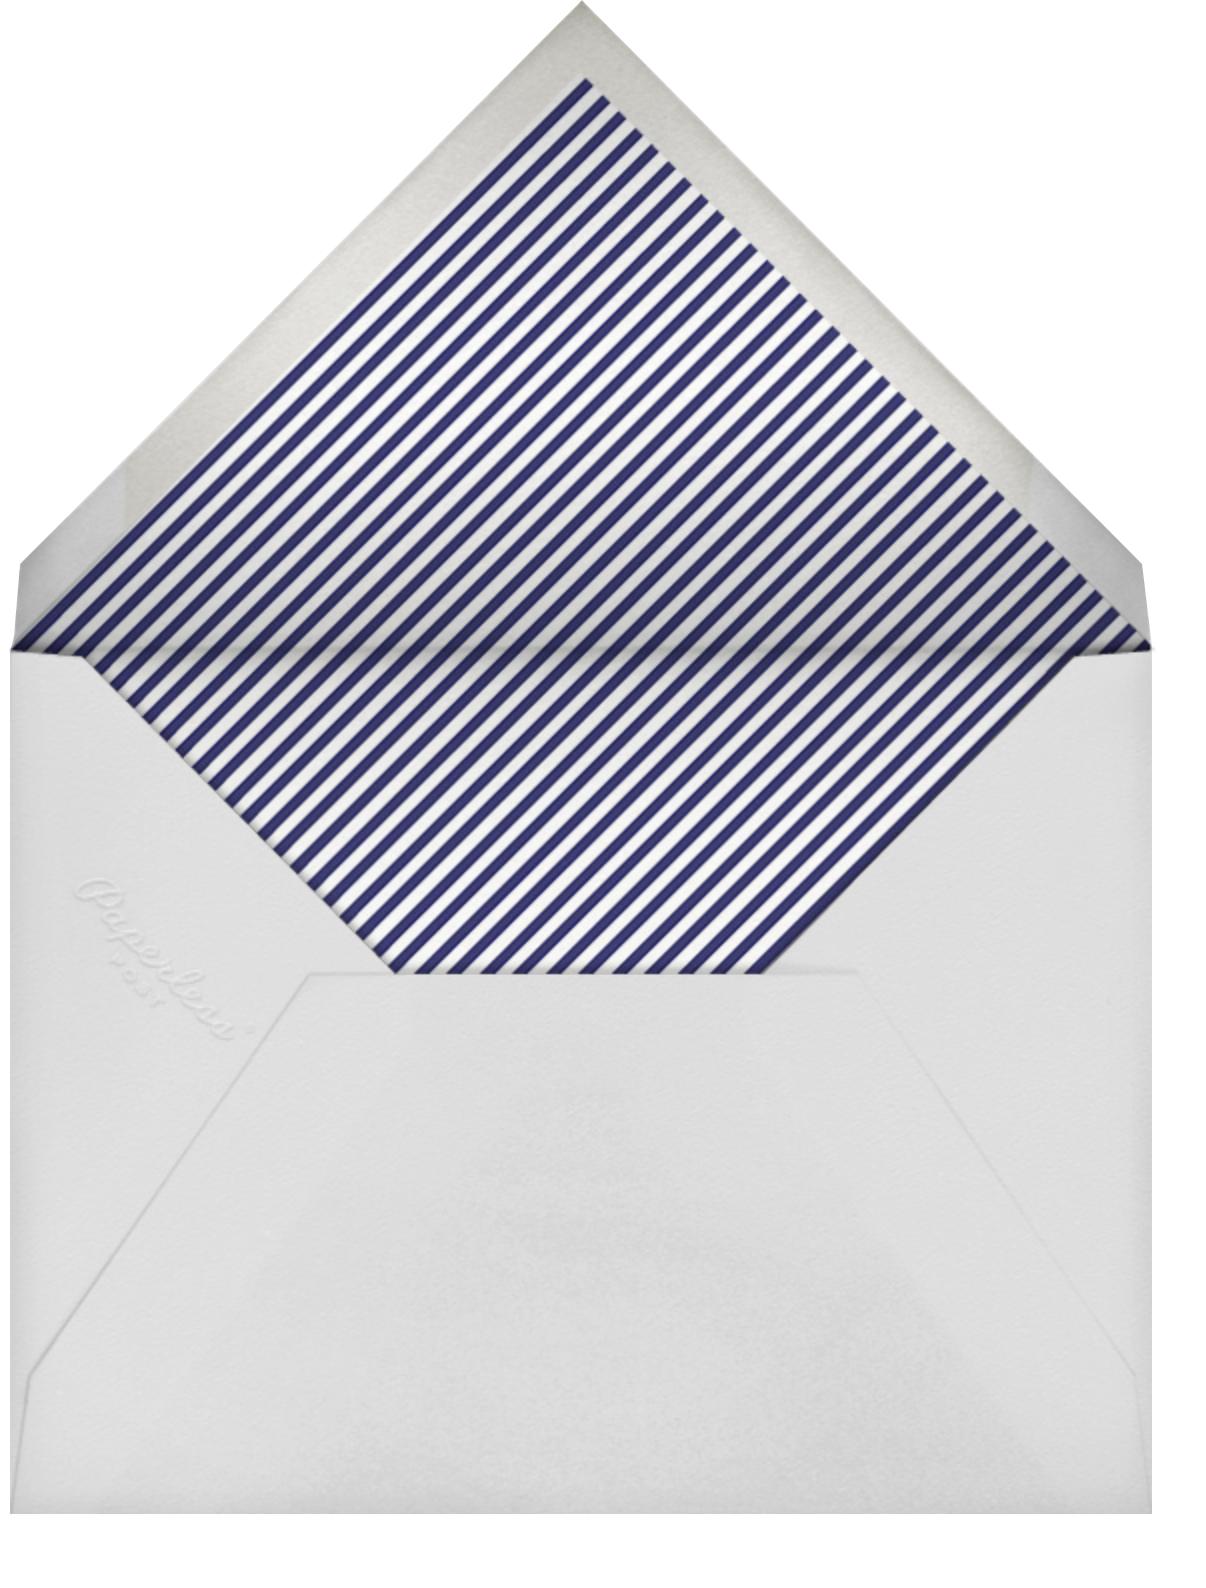 Flip The Burger - Red - Mr. Boddington's Studio - Barbecue - envelope back